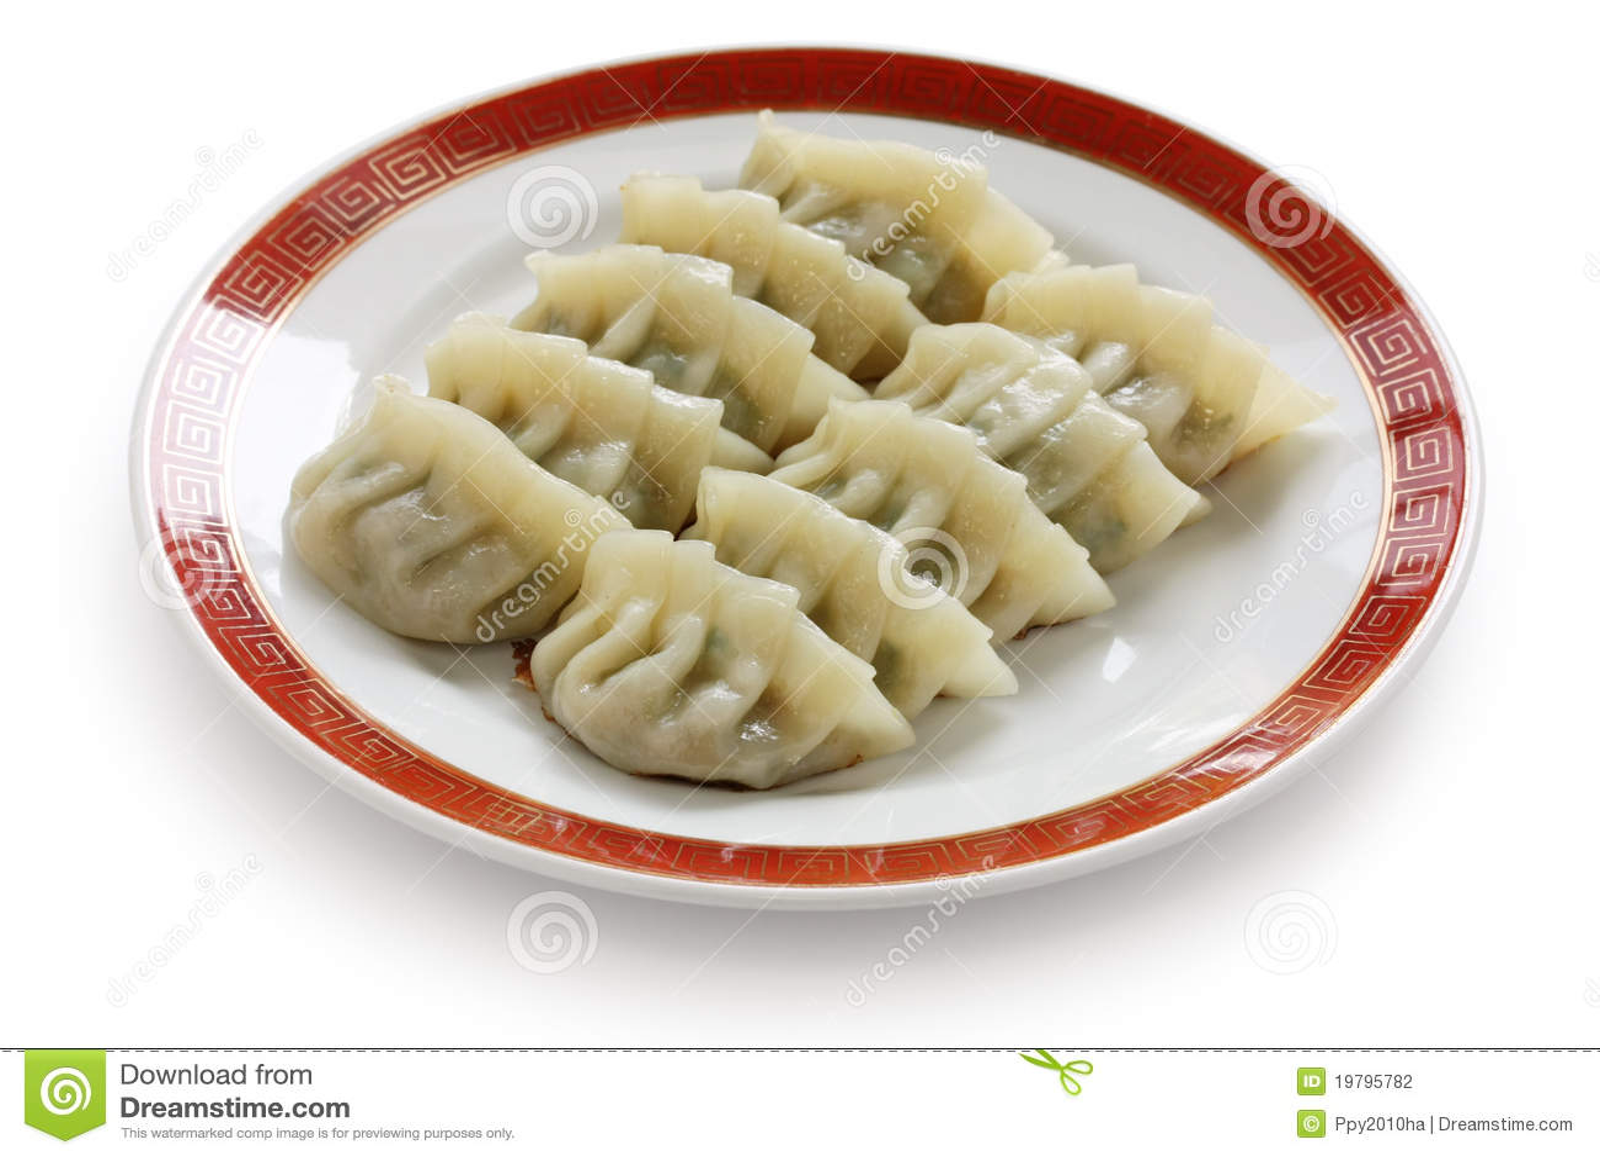 What Is Fried Dumplings Chinese Food